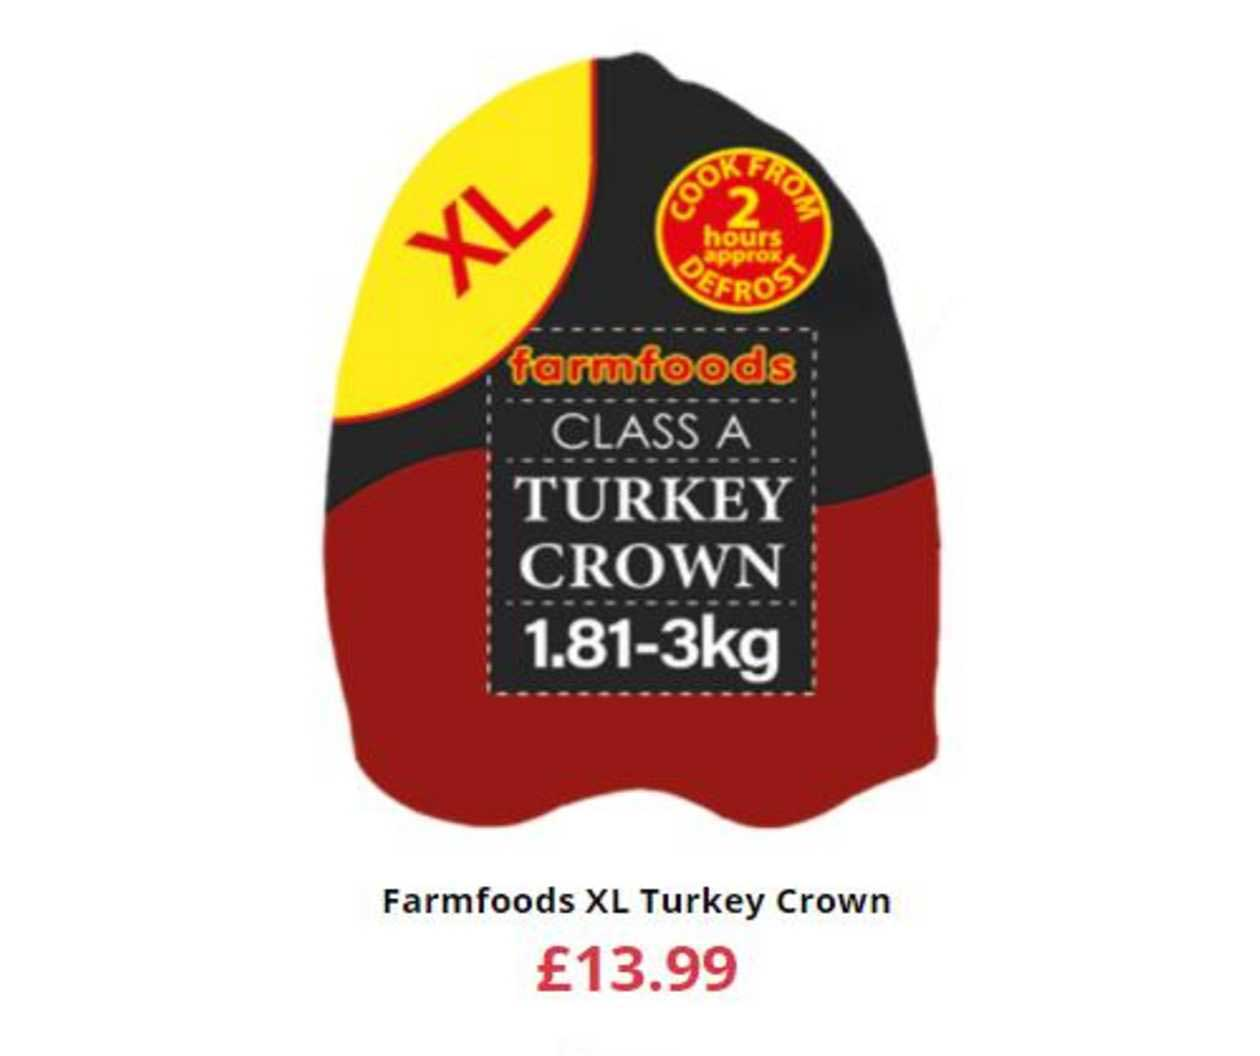 Farmfoods Farmfoods XL Turkey Crown